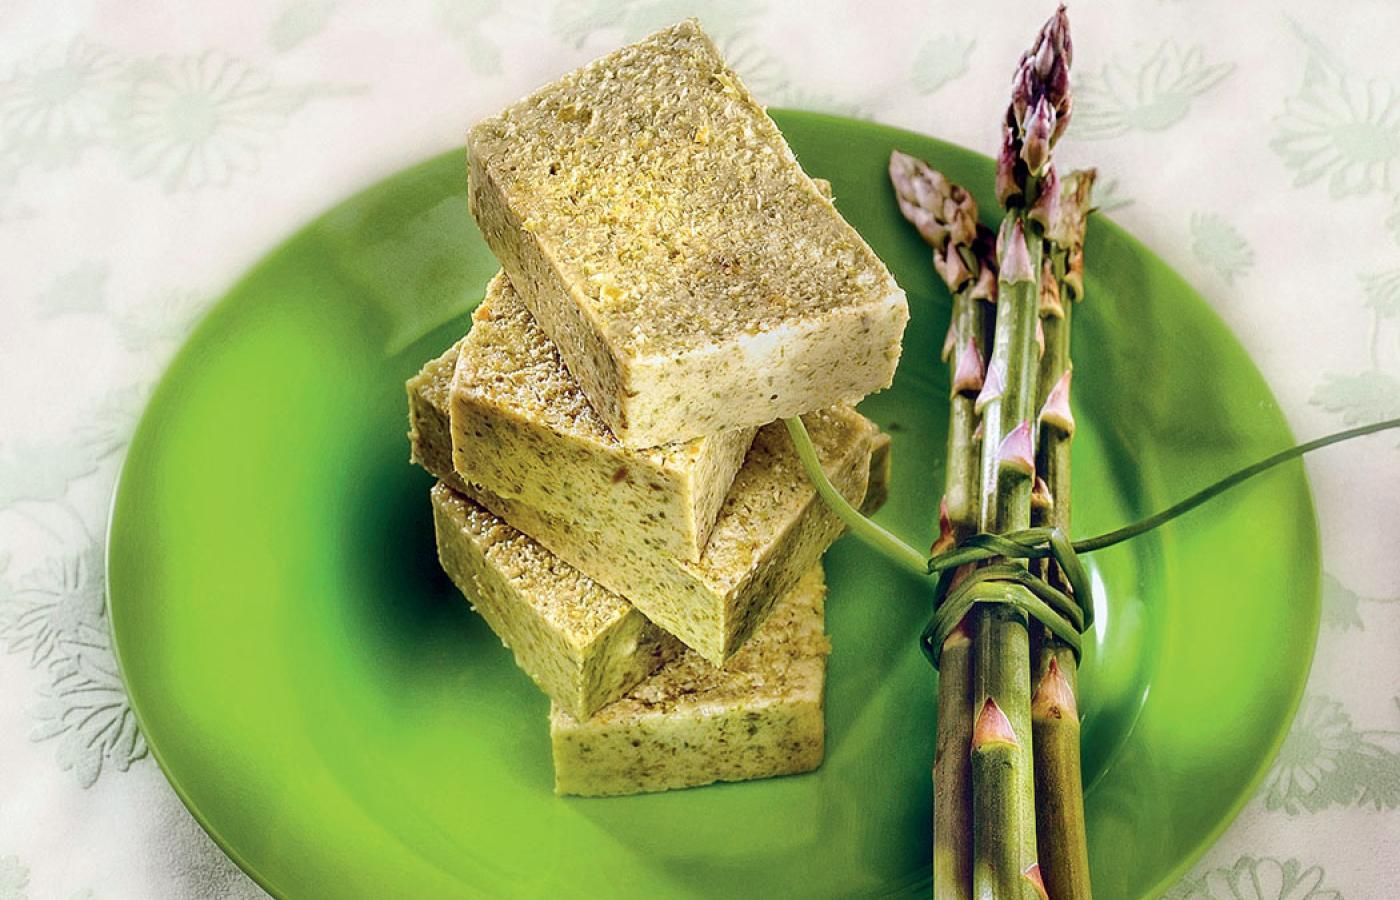 Czym Jest Kuchnia Note By Note Bigos Superesencjonalny Polityka Pl